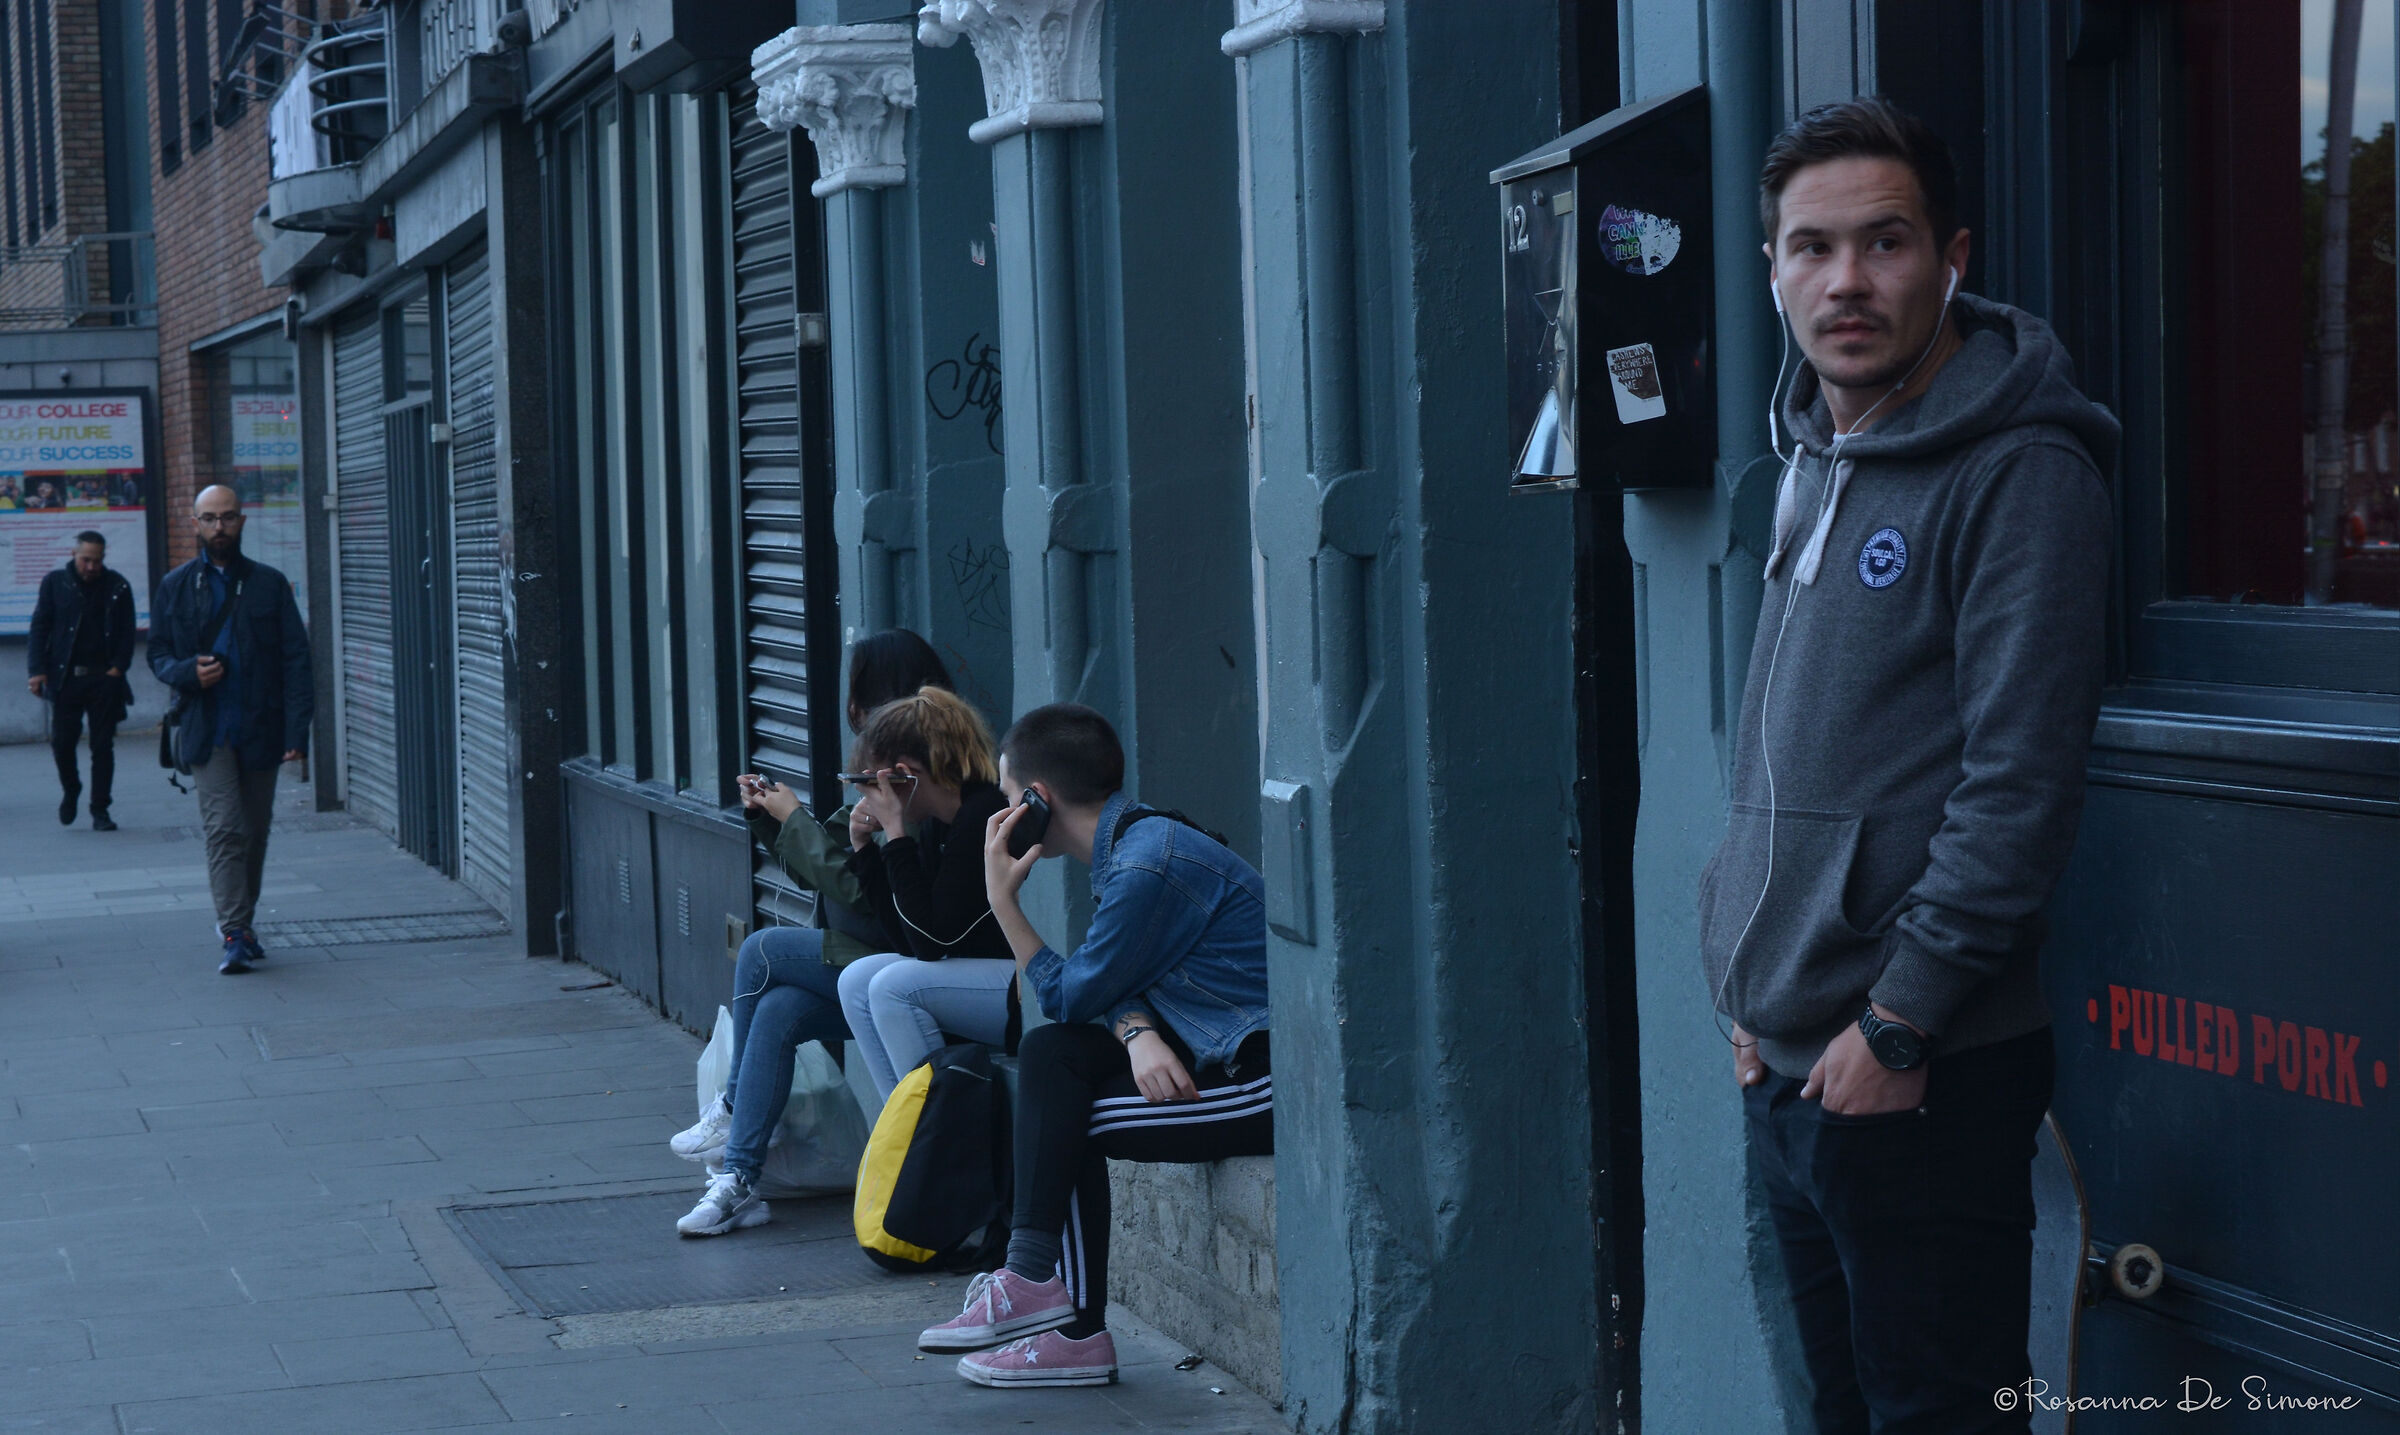 Camminando a Dublino...